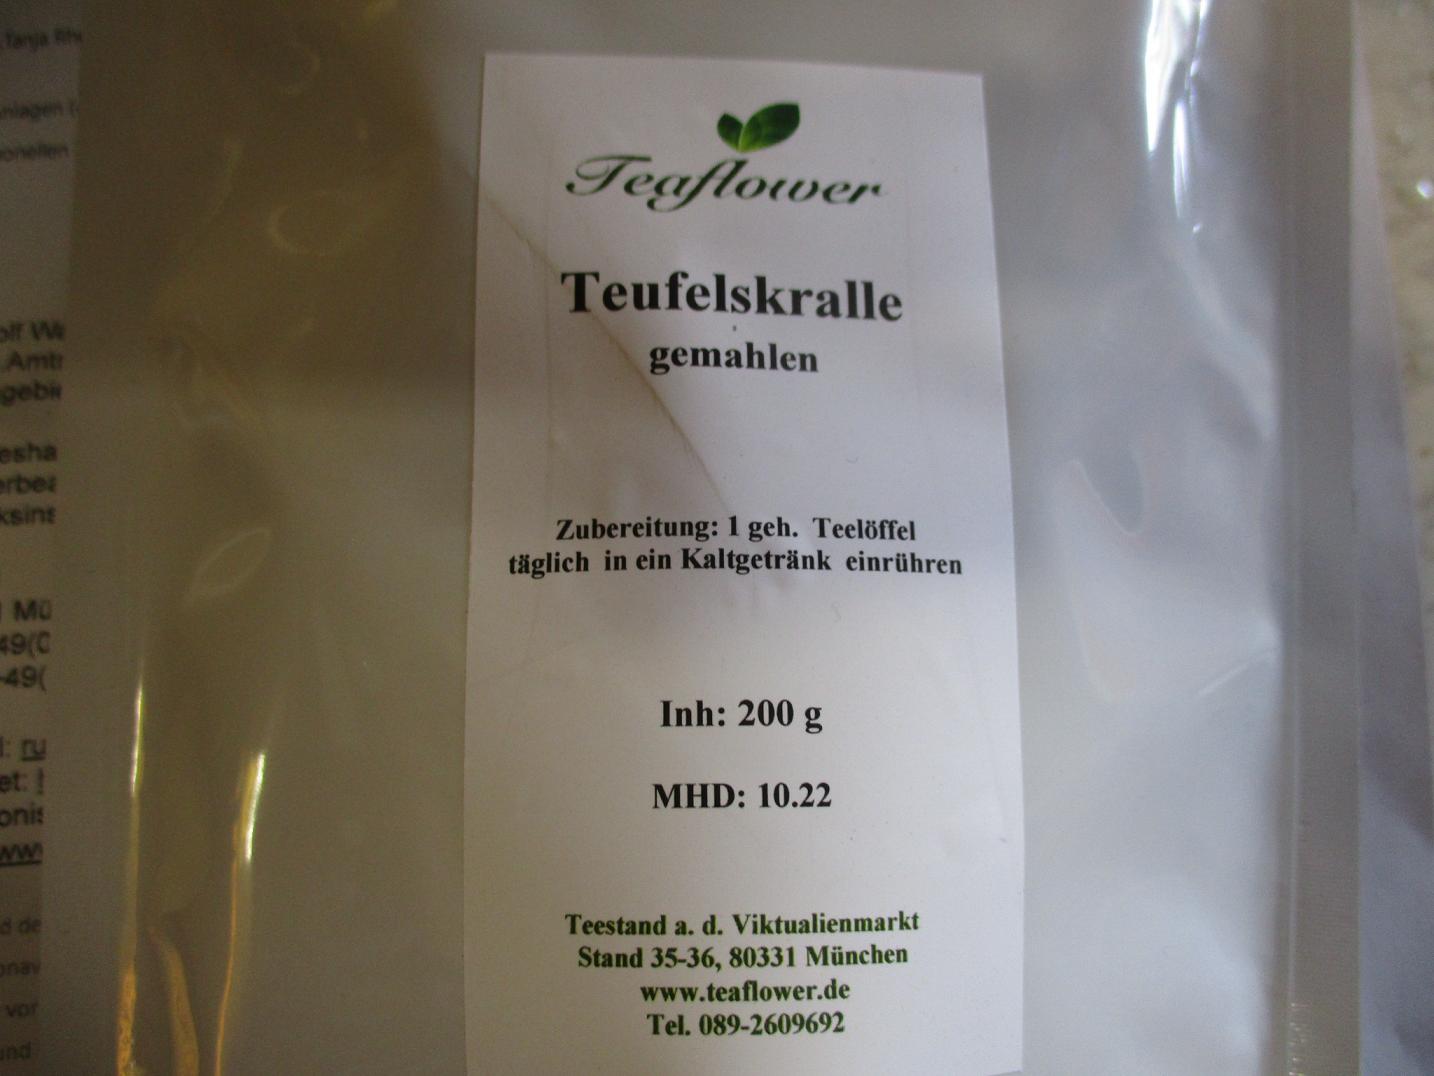 Produktrueckruf Teaflower Teufelskralle Gemahlen